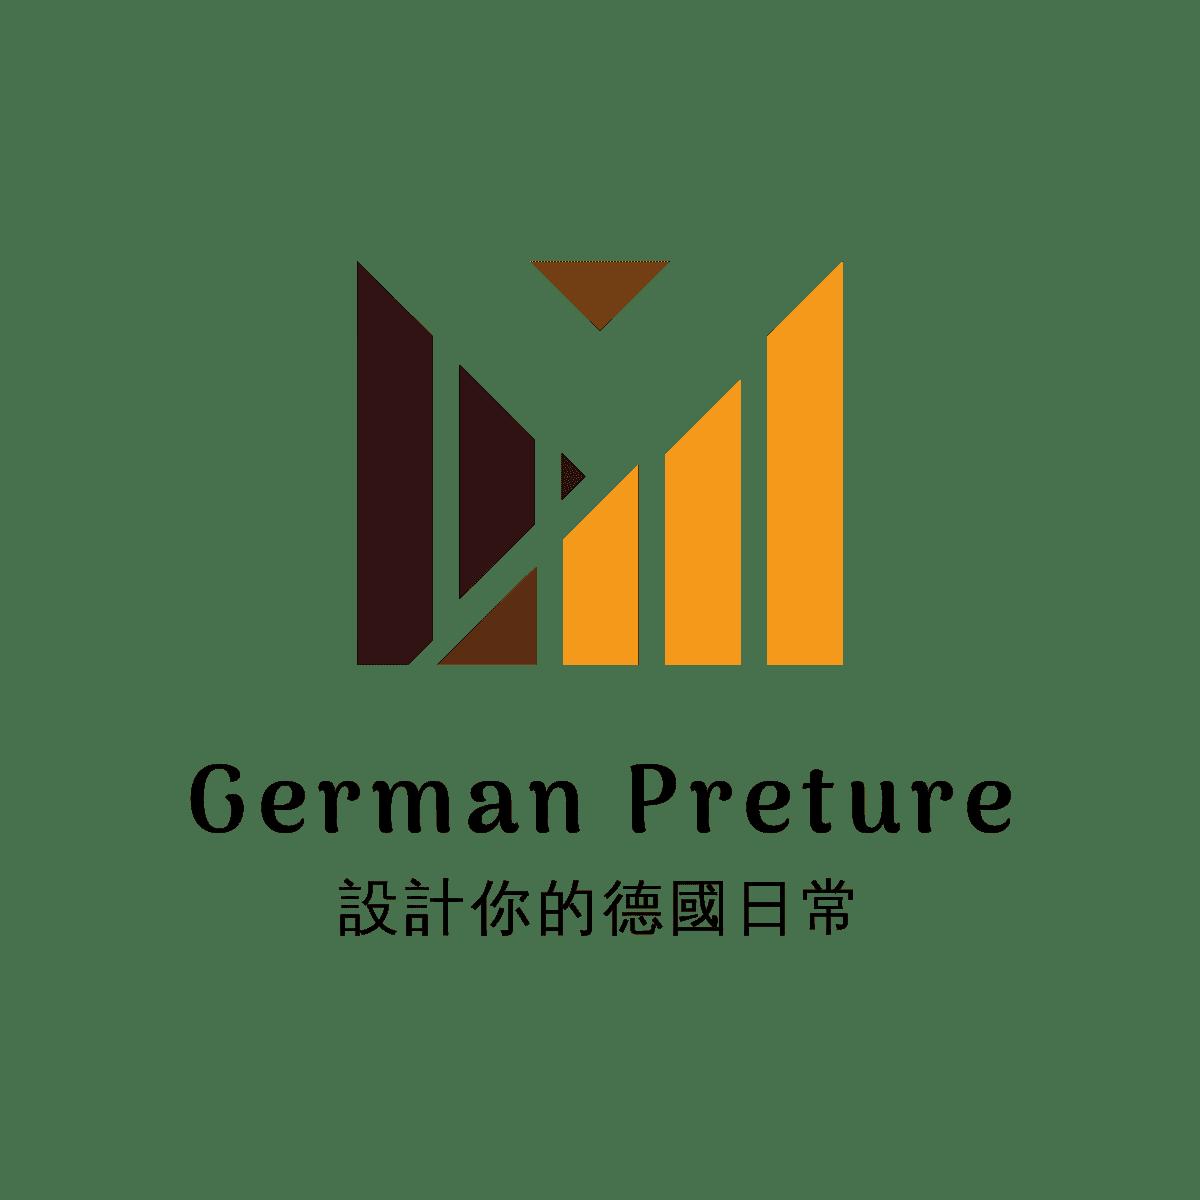 German-preture |設計你的德國日常 Logo